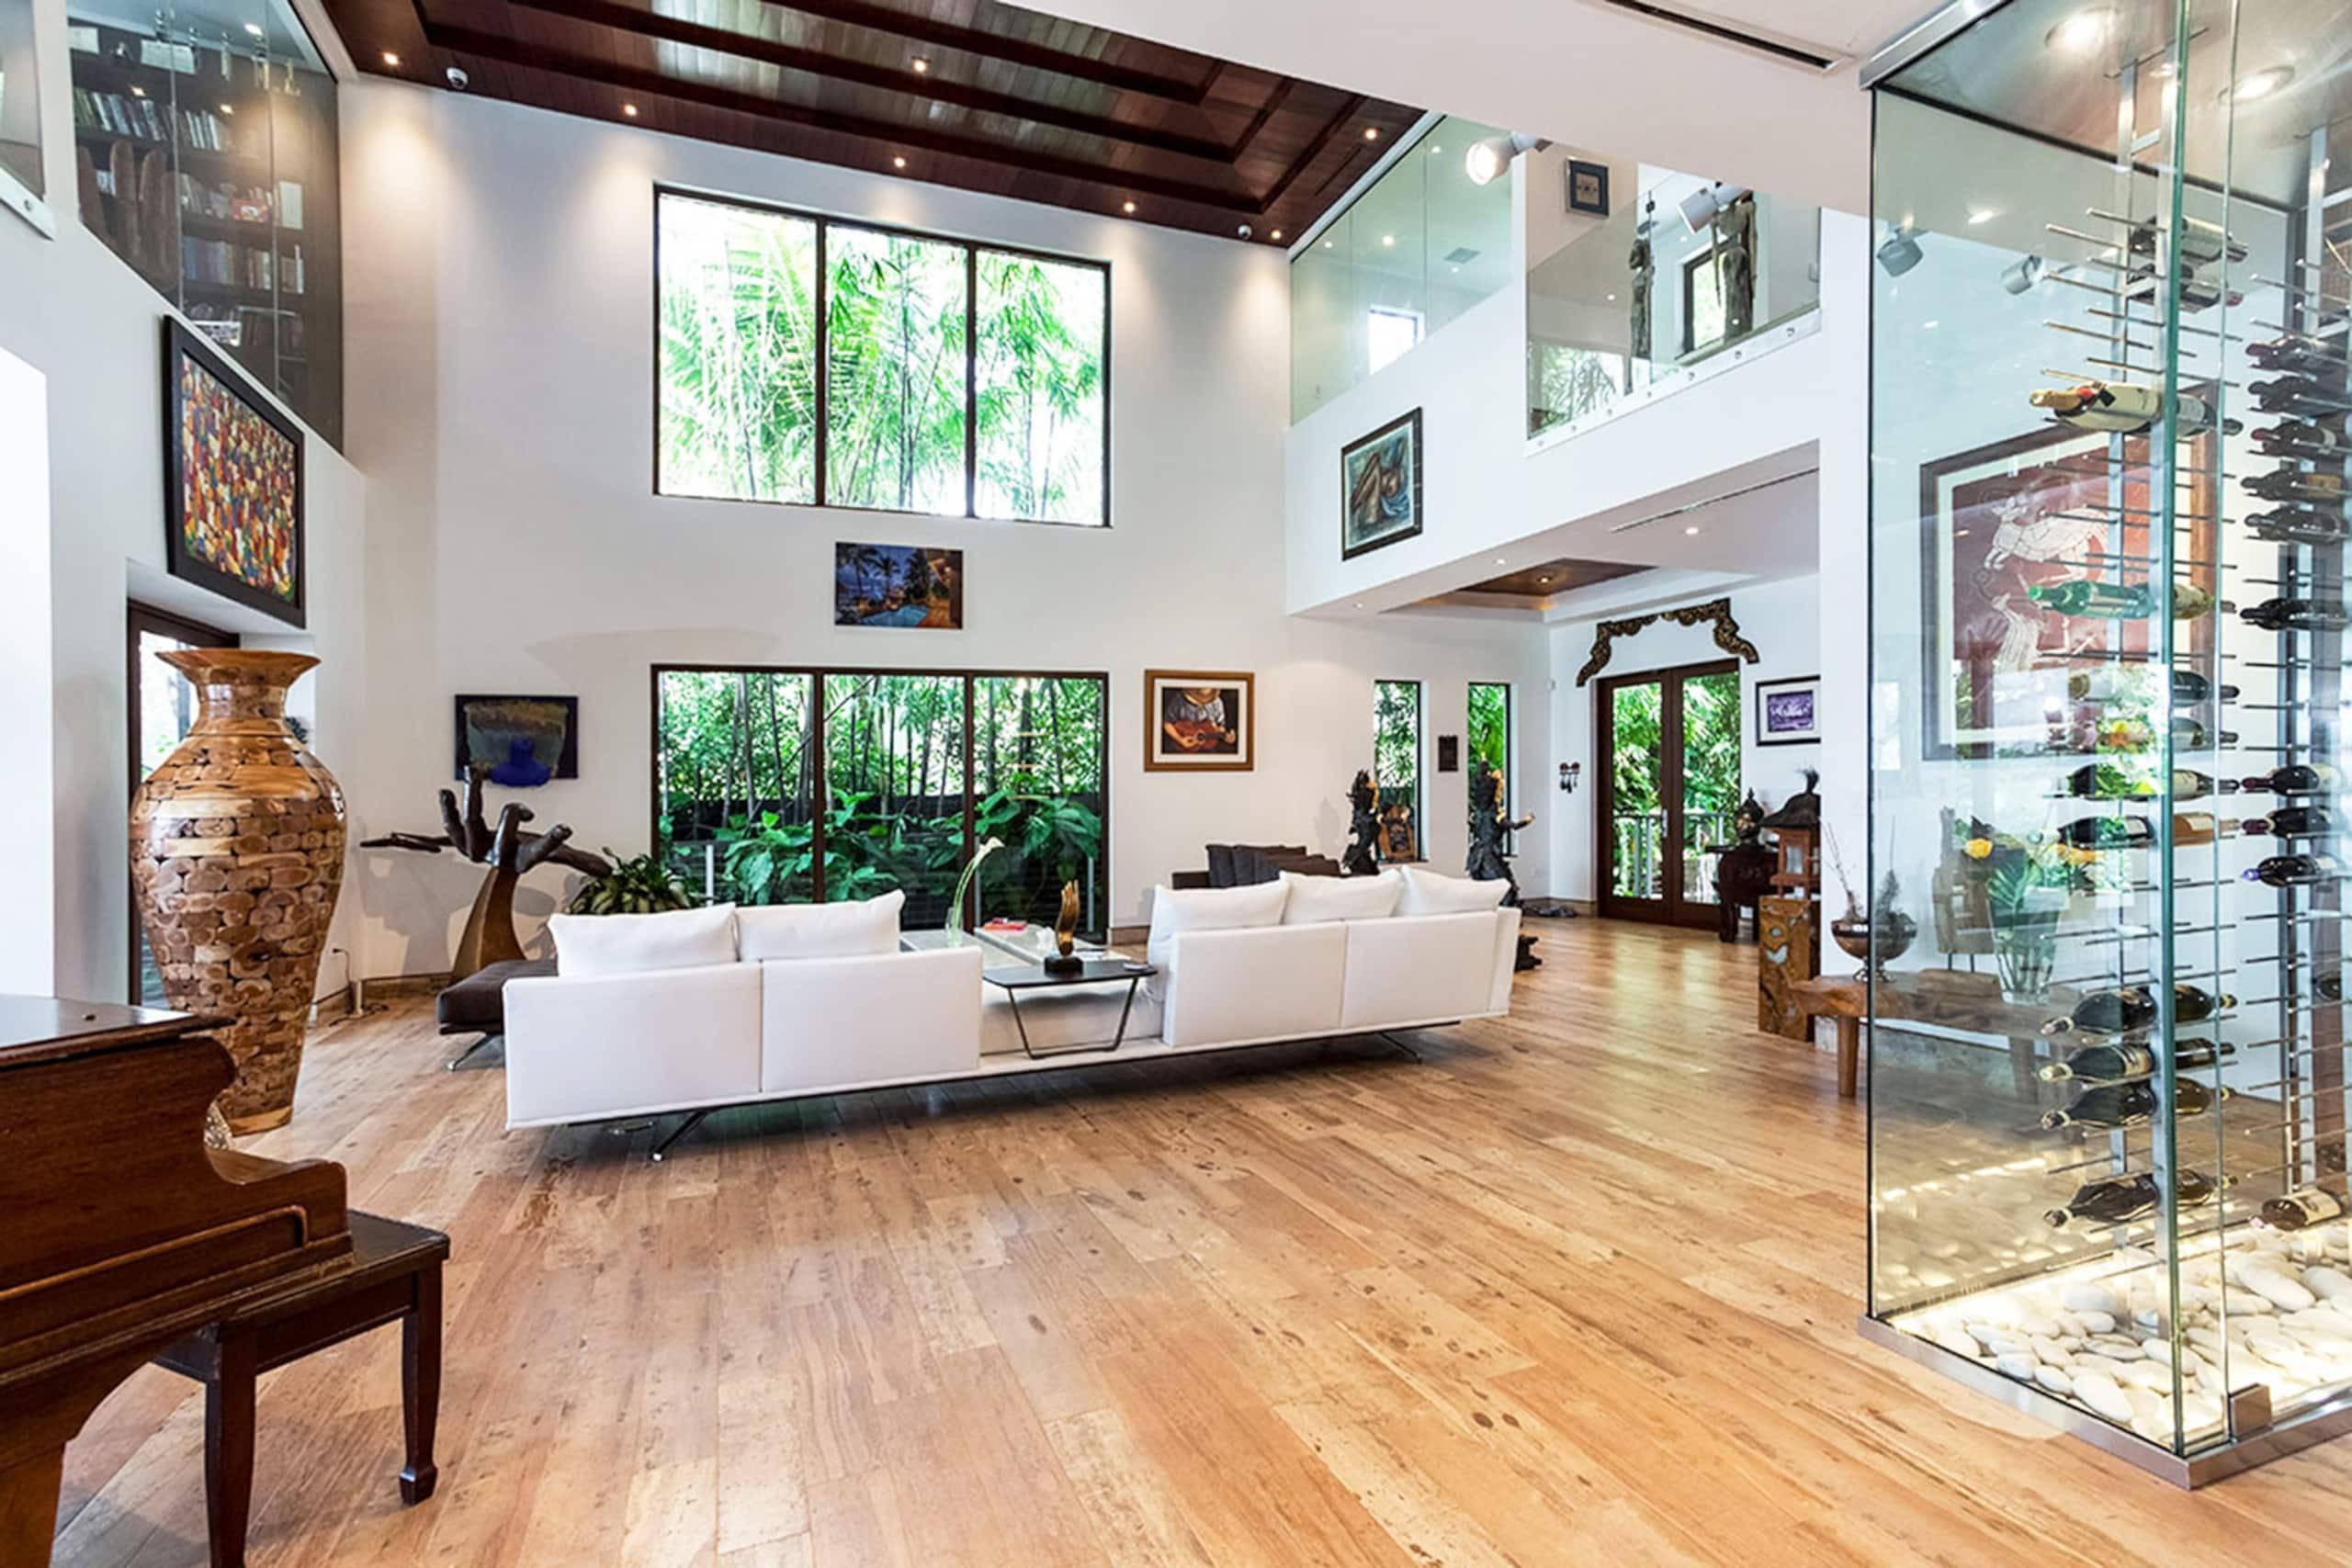 Apartment Villa Riza - Magnificent Balinese-style photo 20108746